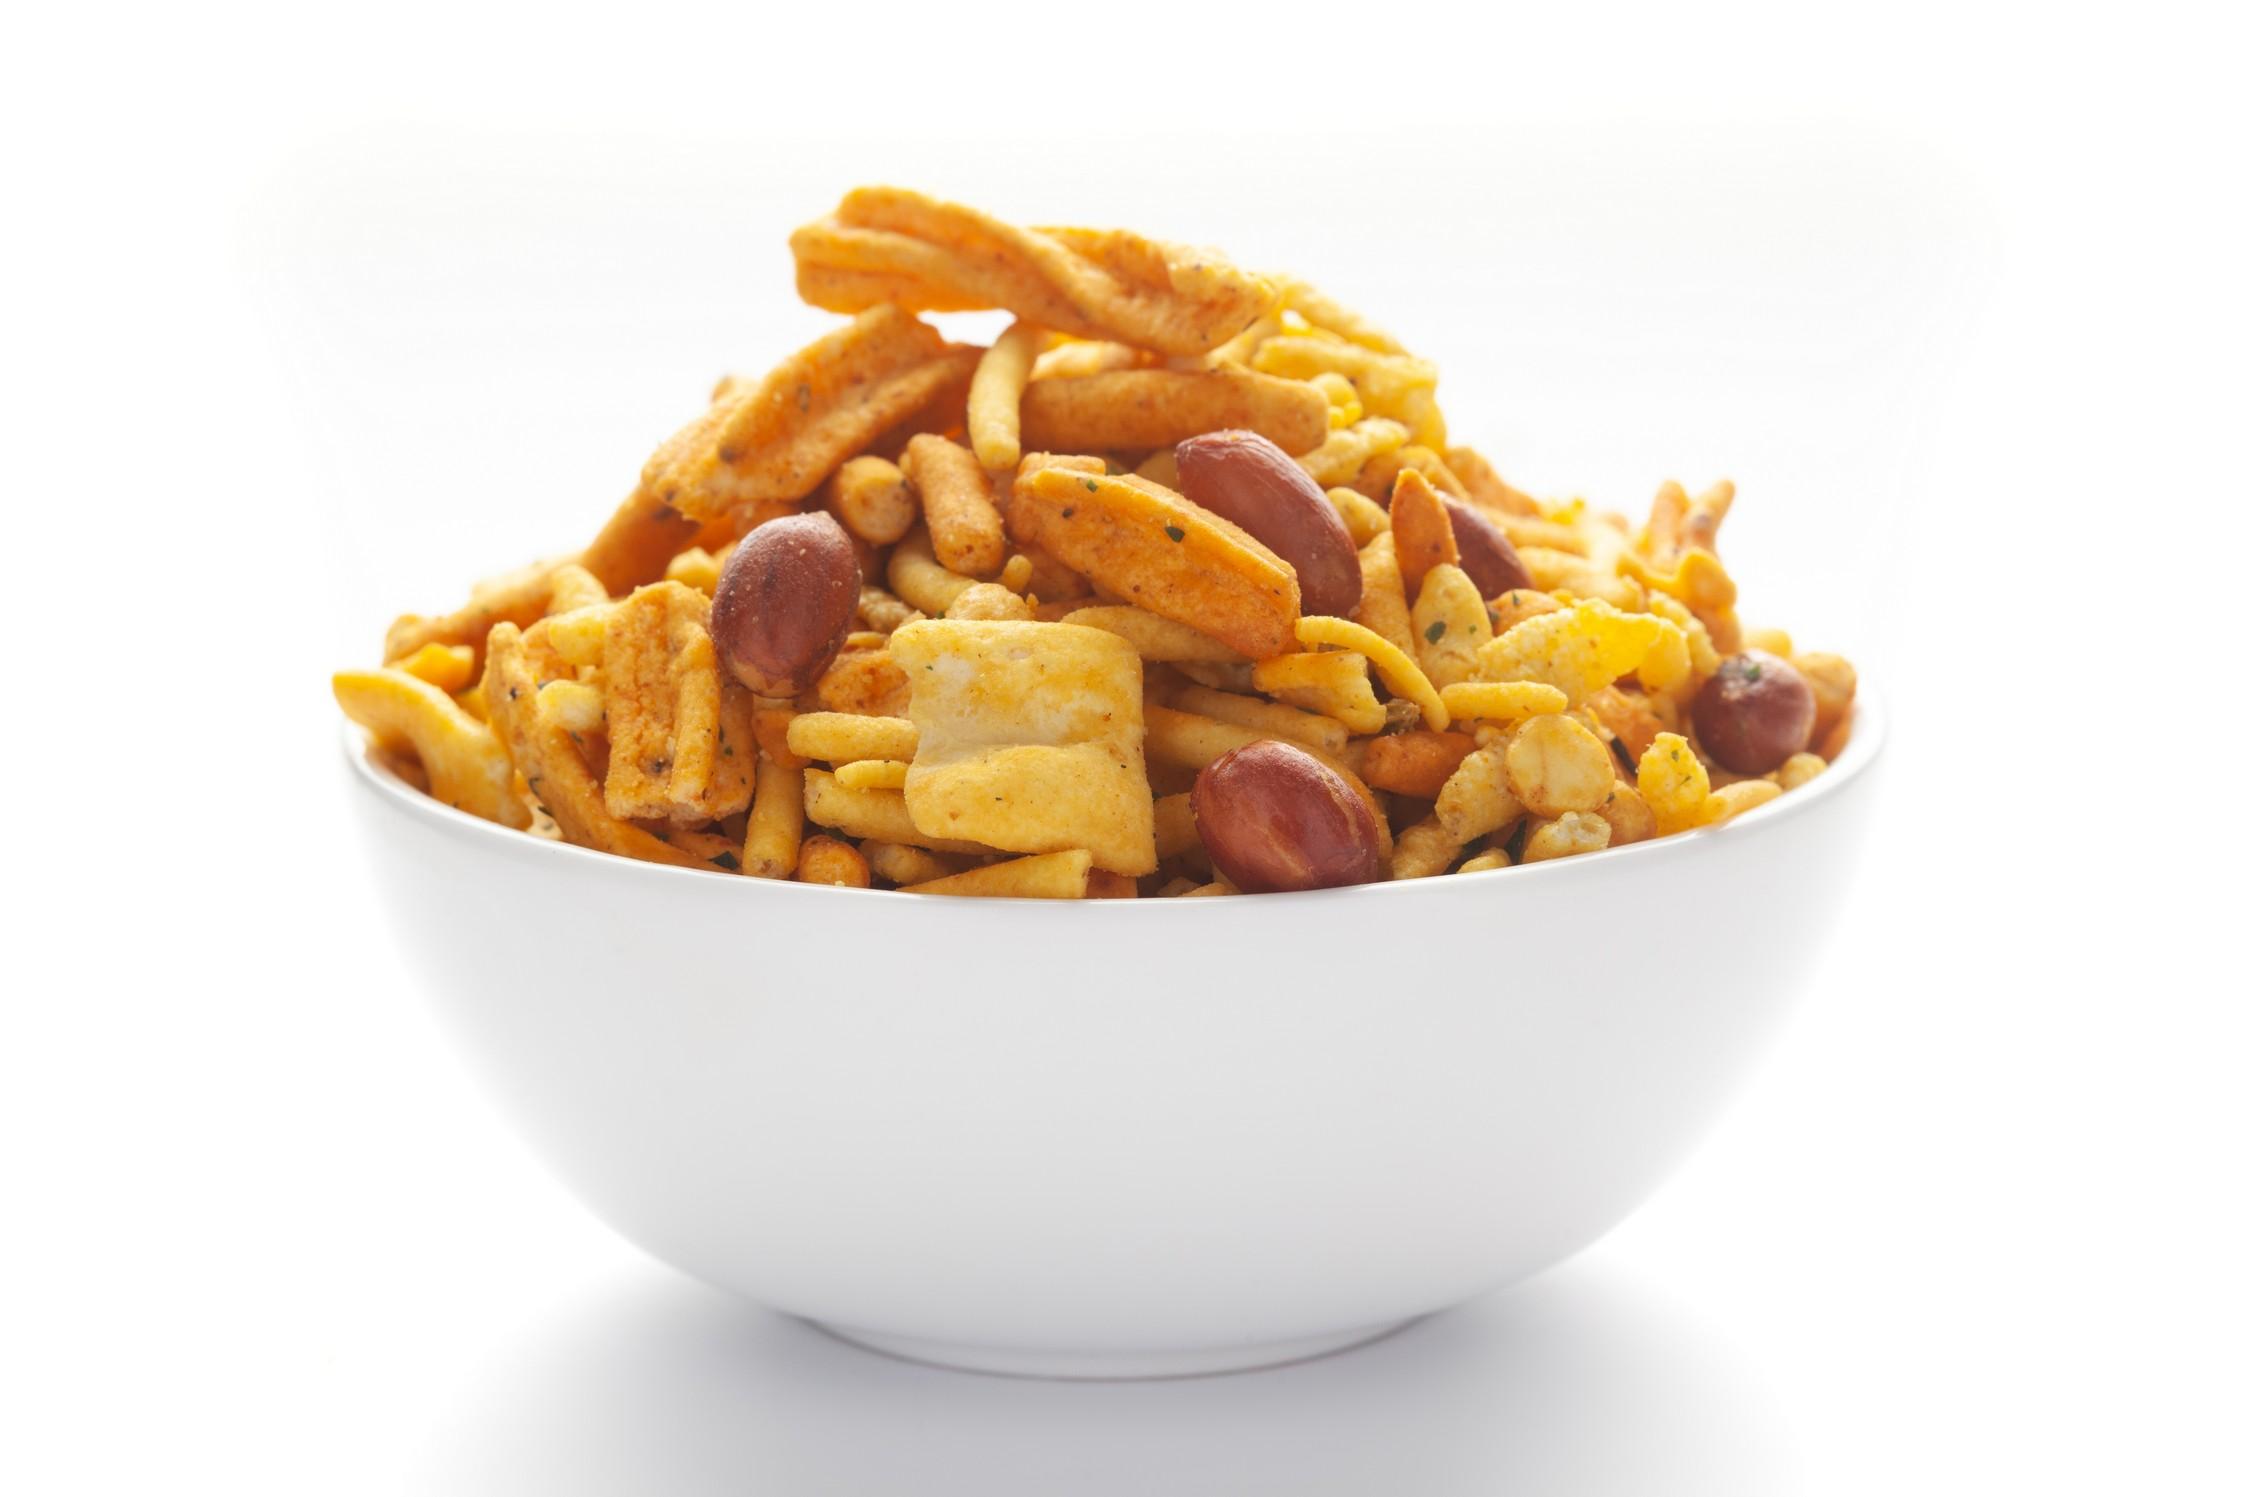 Baltimore, MD Snacks | Alternative Snack Options | Corporate Wellness